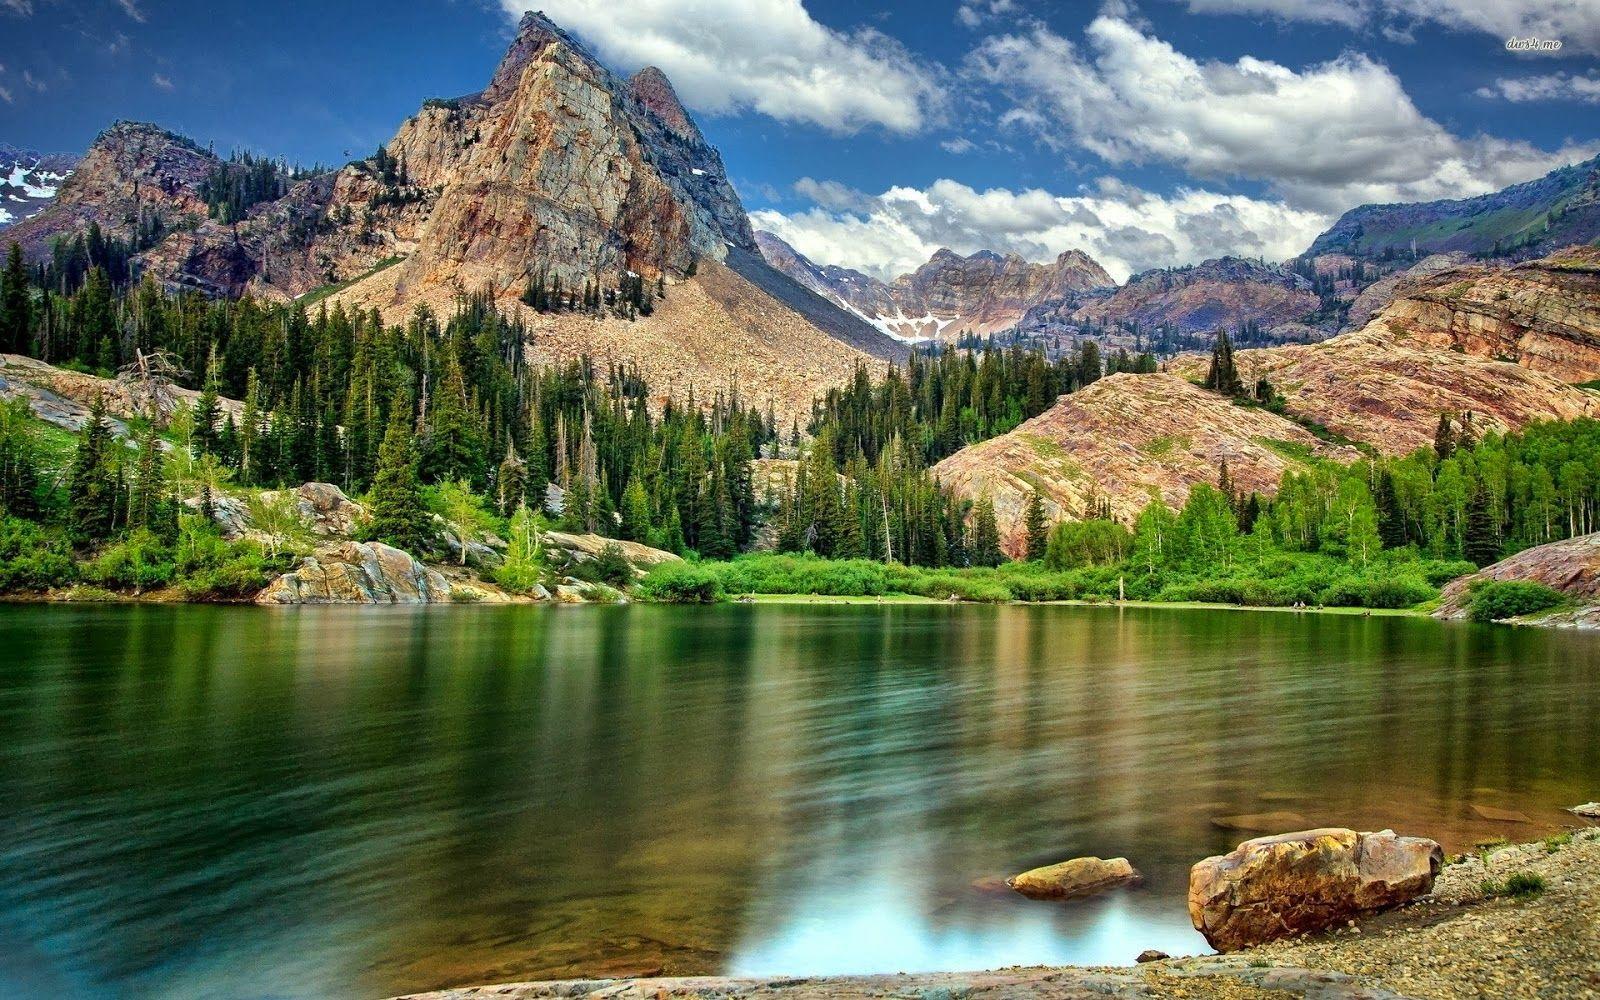 wallpapers hd paisajes im genes gratis para fondos y